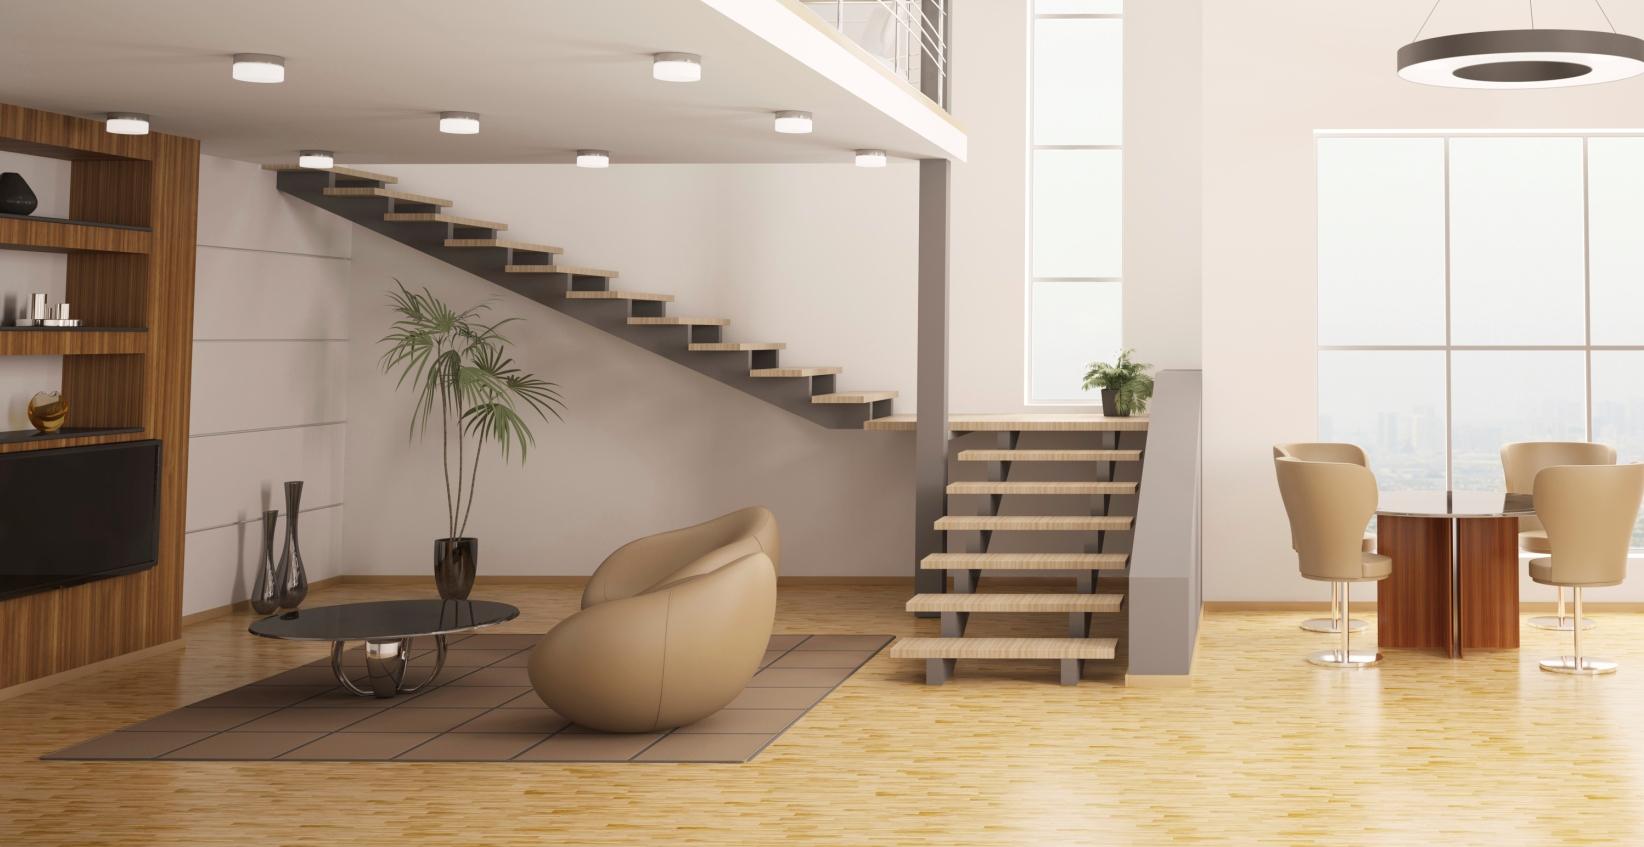 Apartment Diy Ideas: Apartment astounding diy home decor eas for ...